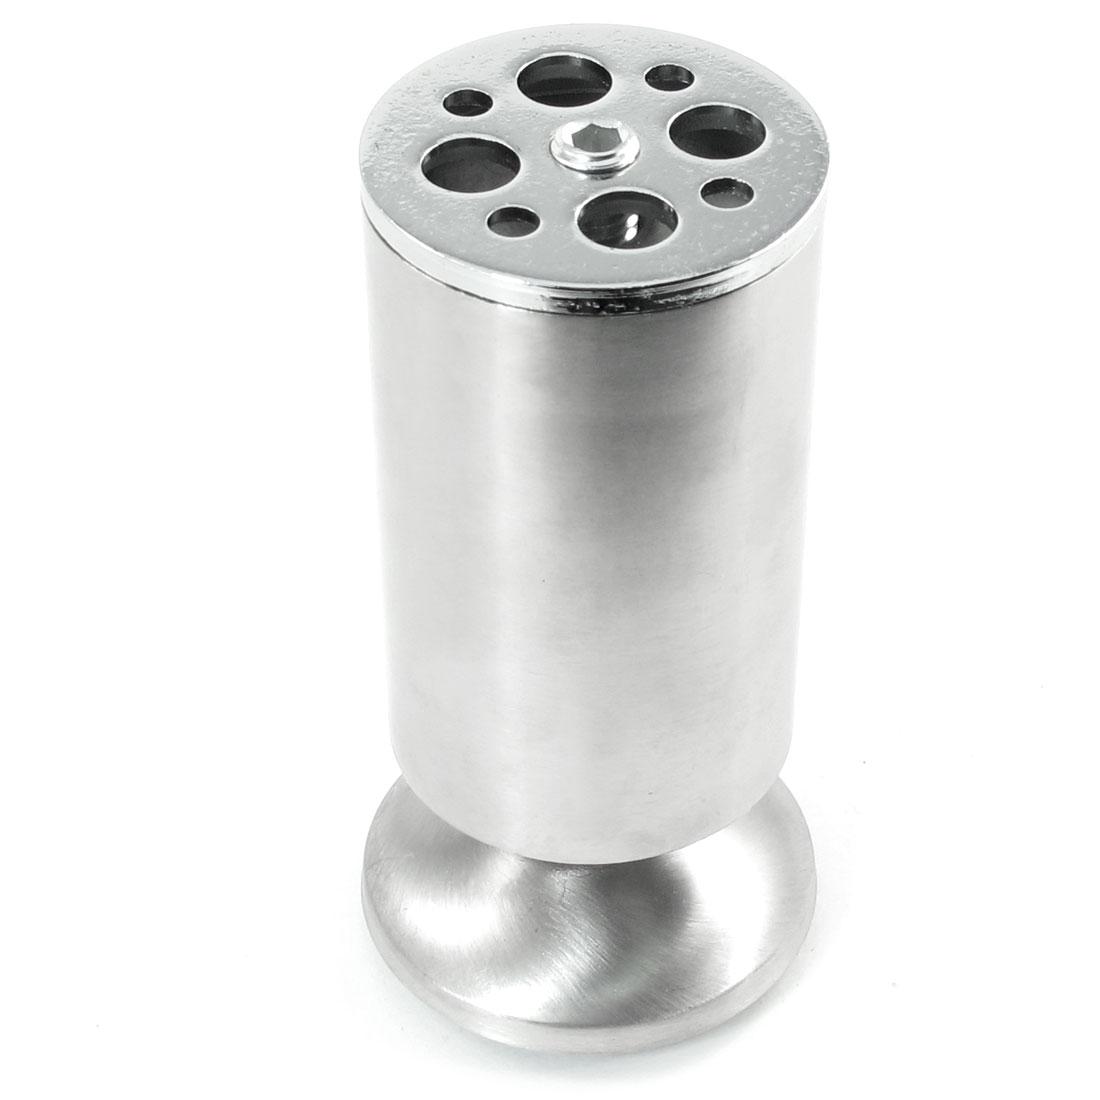 Multihole Silver Tone 11.7cm High Funnel Design Base Furniture Foot for Cabinet